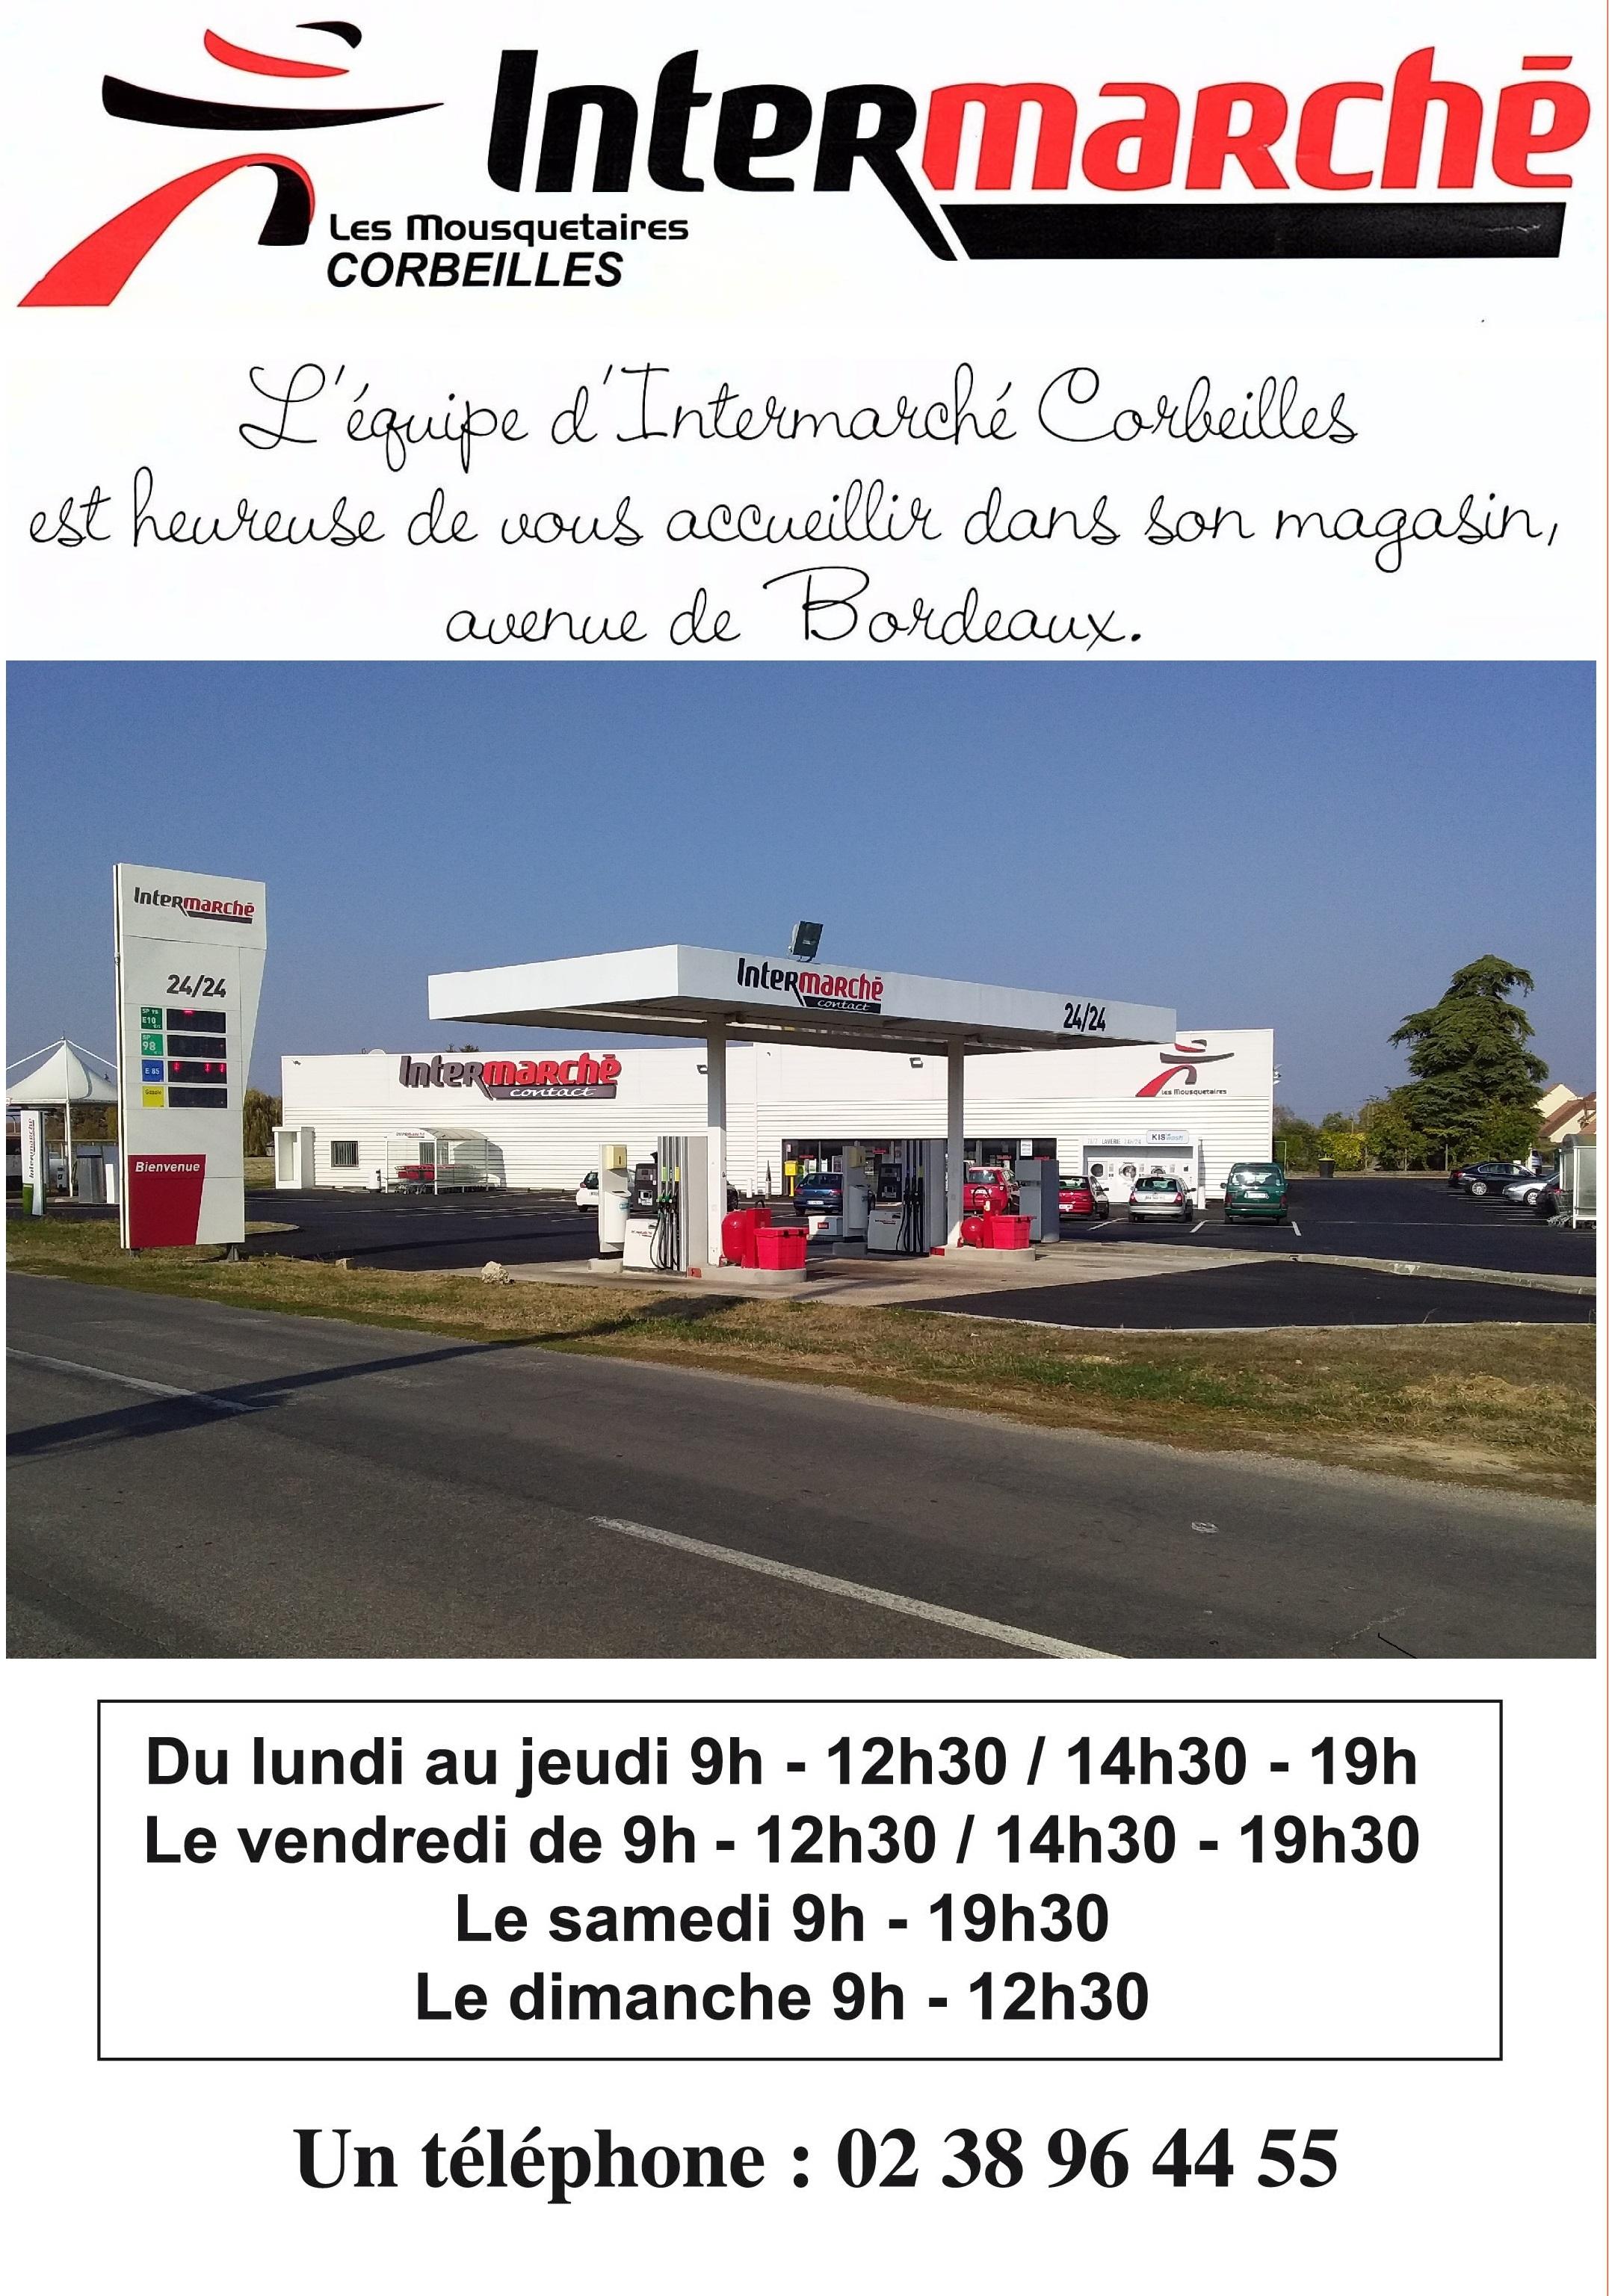 Intermarché Corbeilles